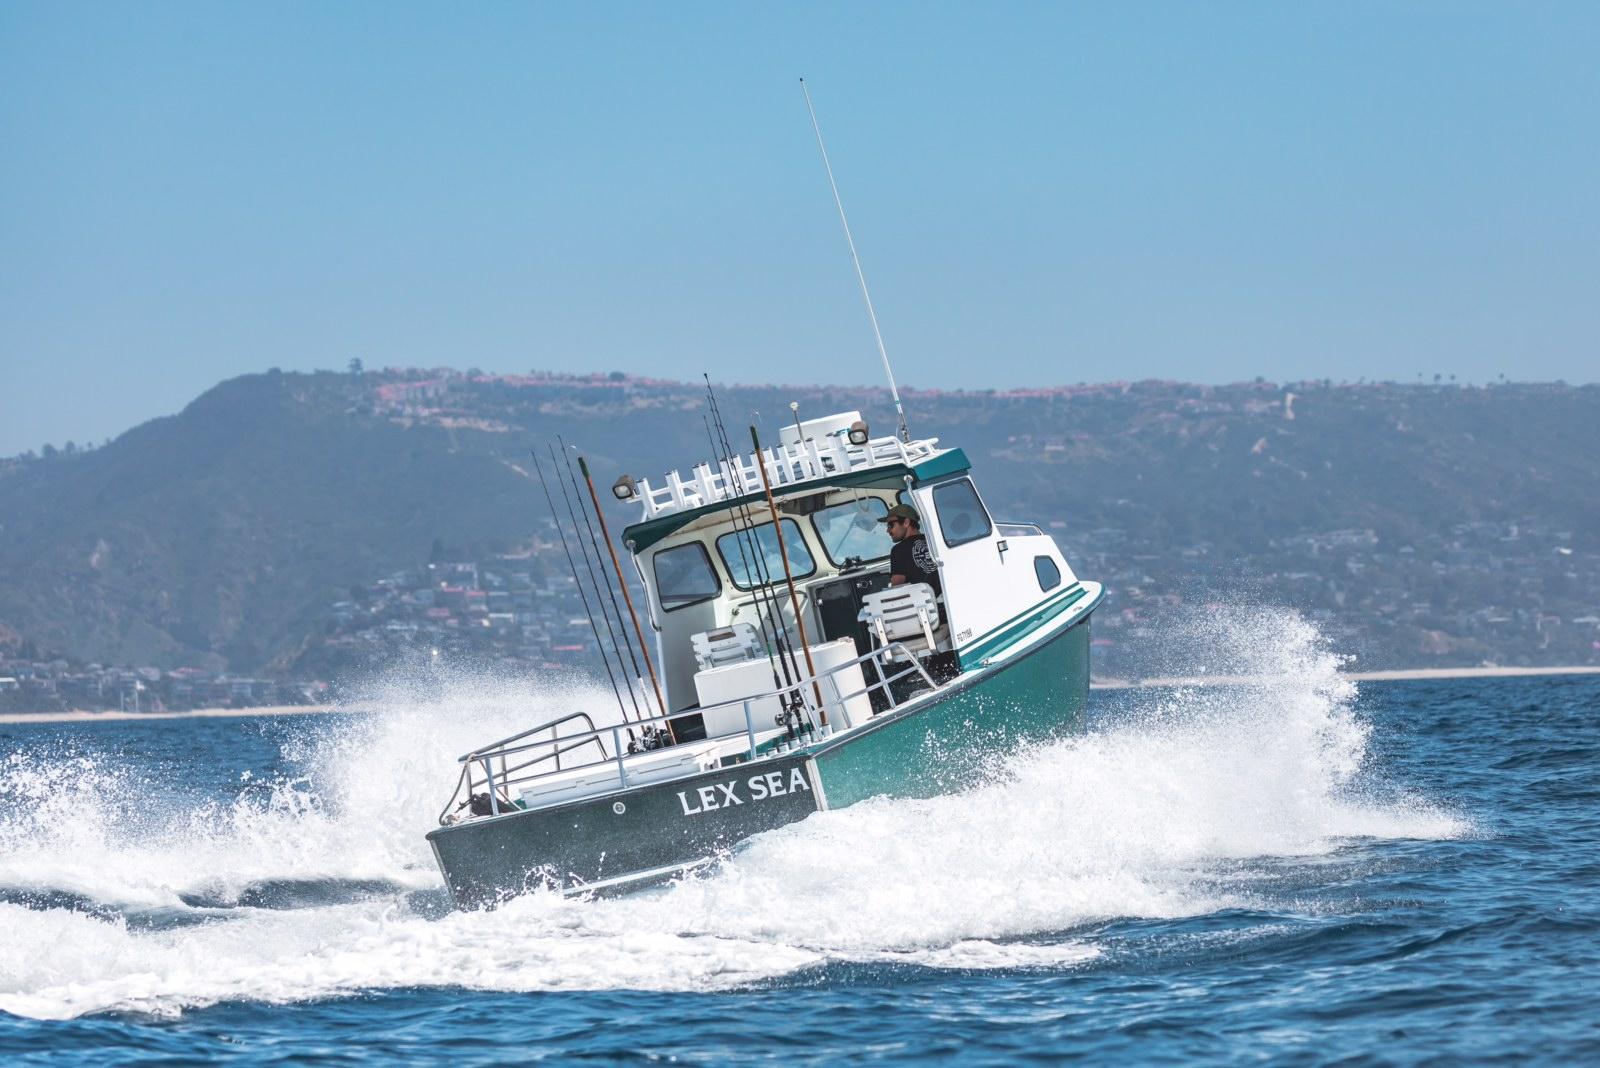 Sportfishing Charters | Private Boat Charter | Dana Wharf